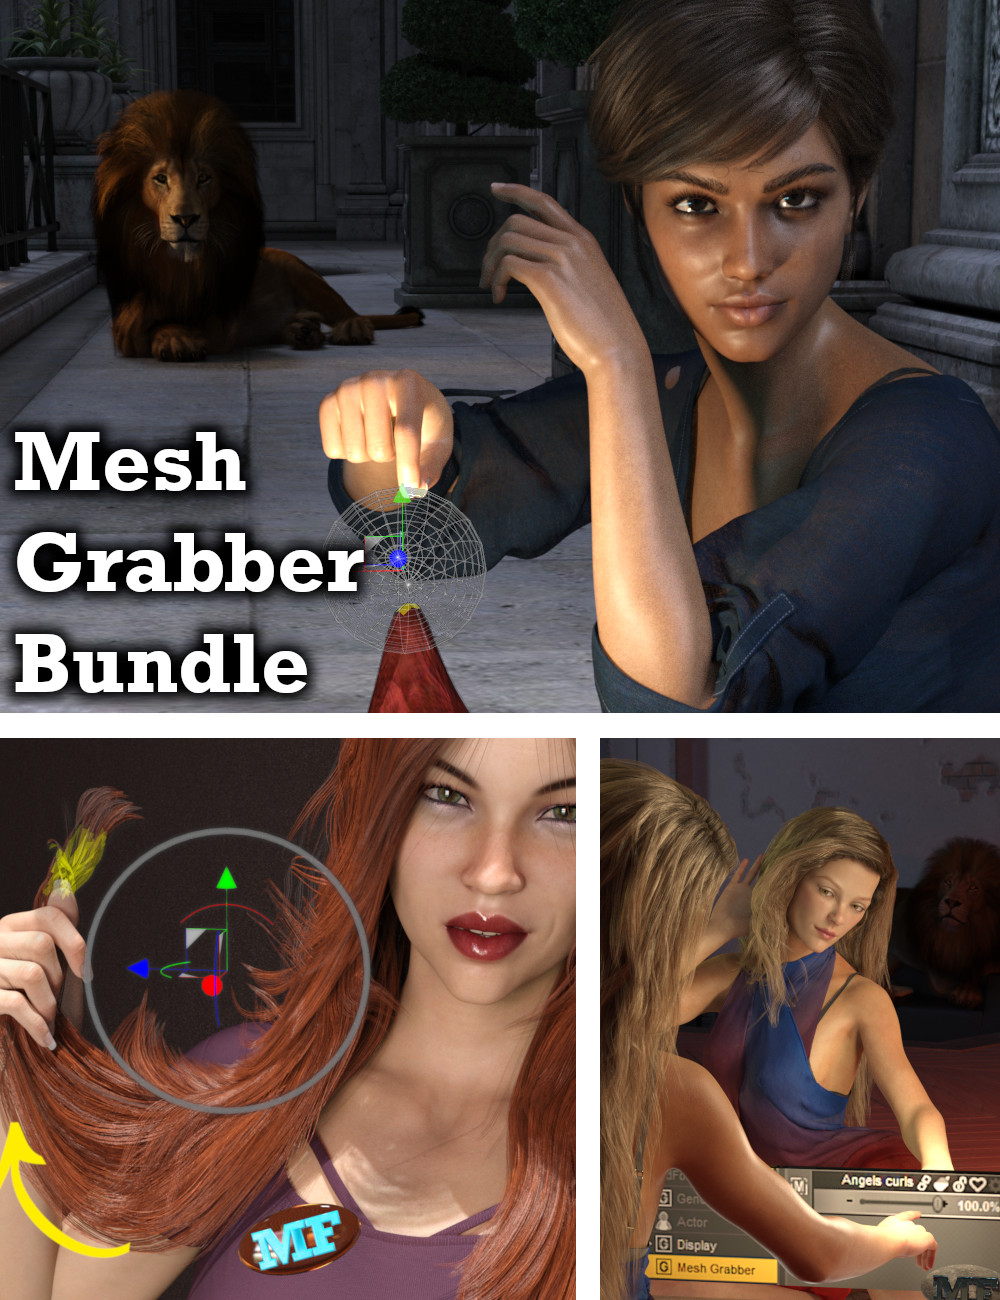 Mesh Grabber Bundle (Win) by: ManFriday, 3D Models by Daz 3D